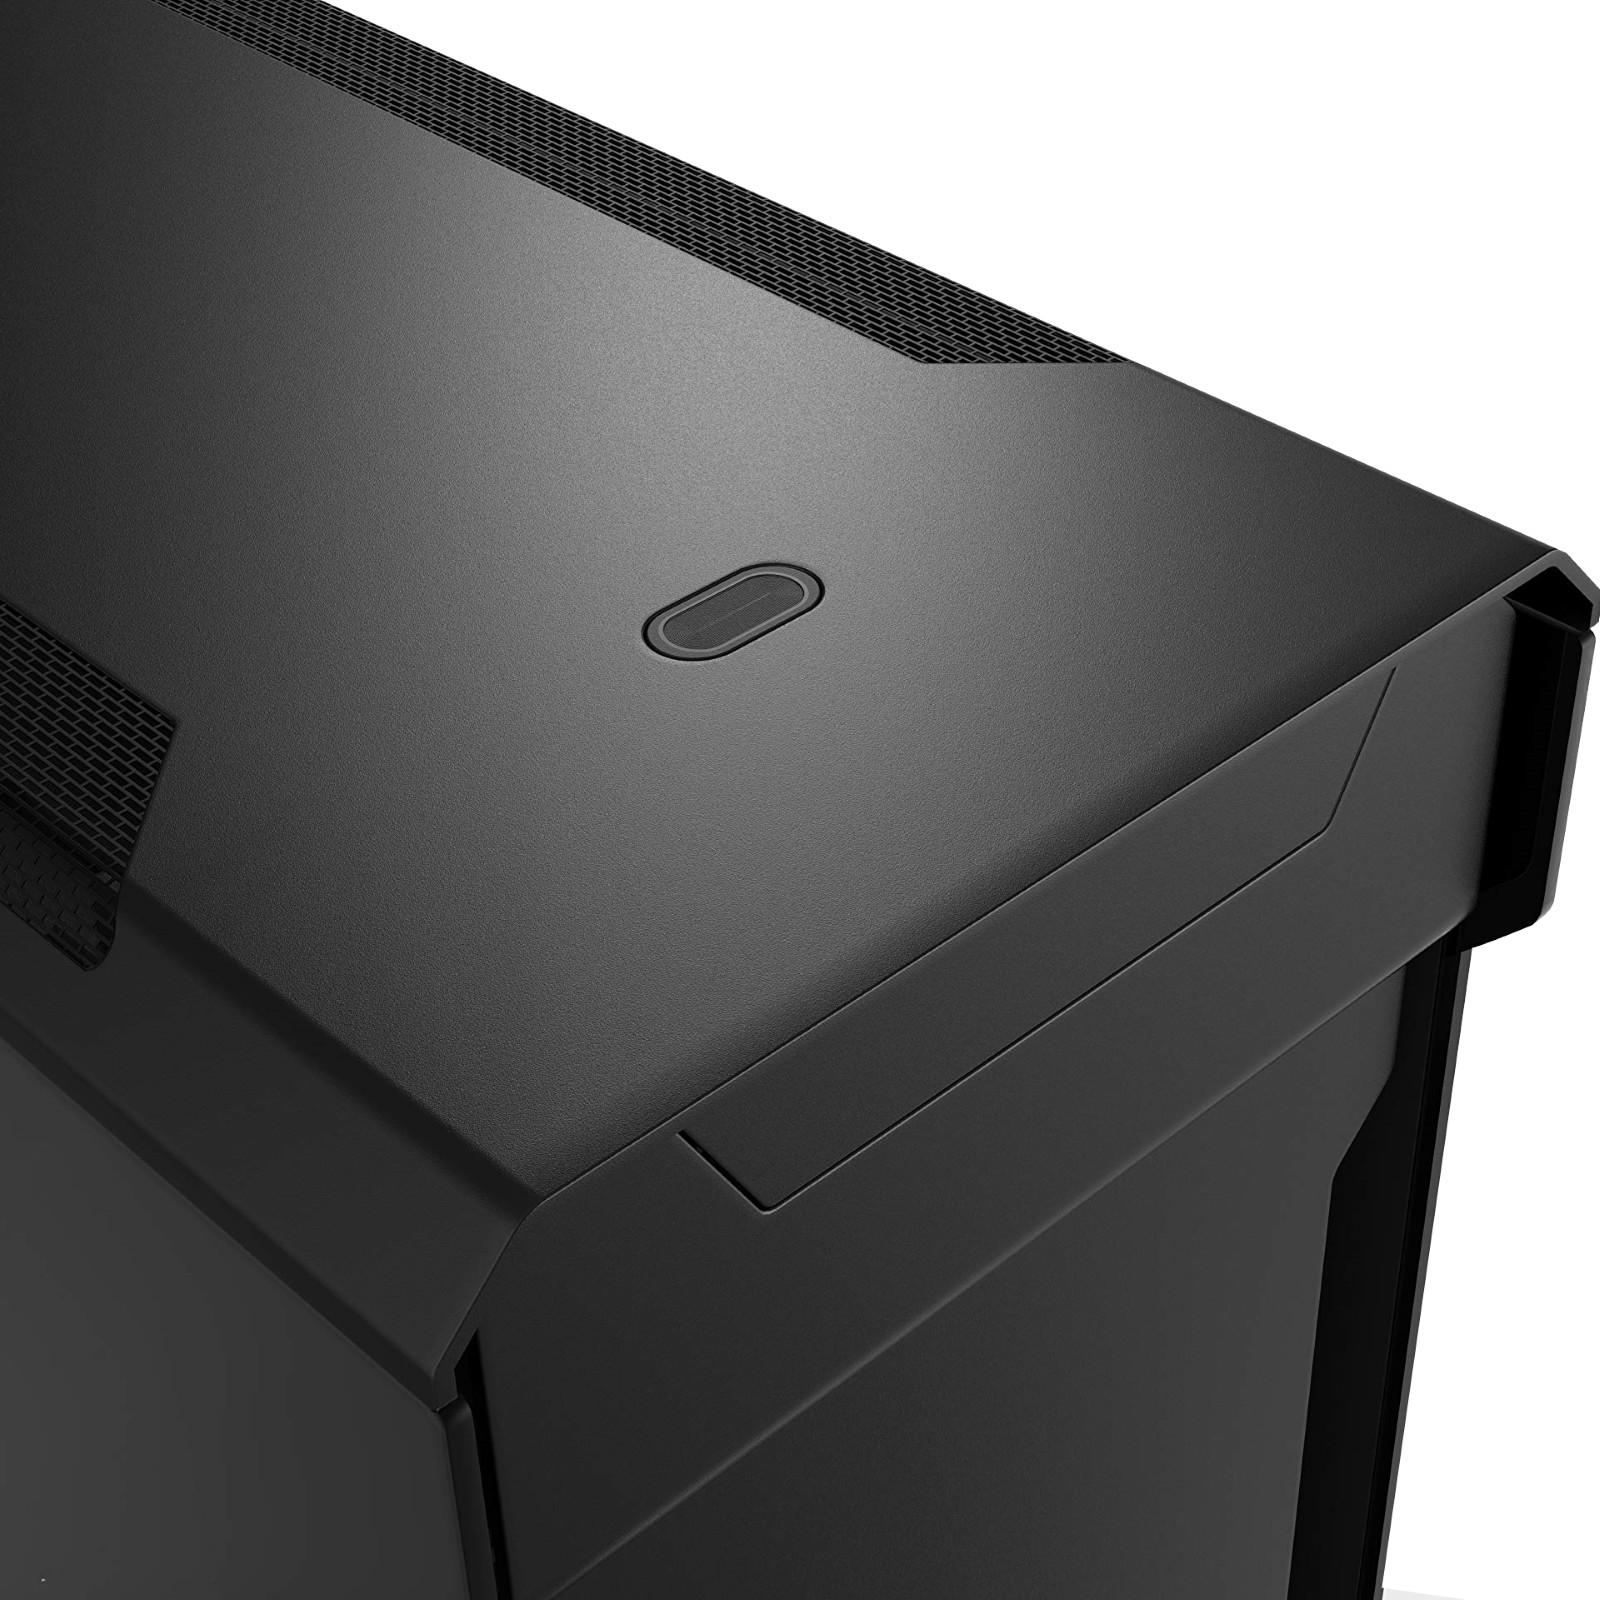 Buy the GGPC IEM Enforcer RTX 2080 Ti Gaming PC Intel 9th